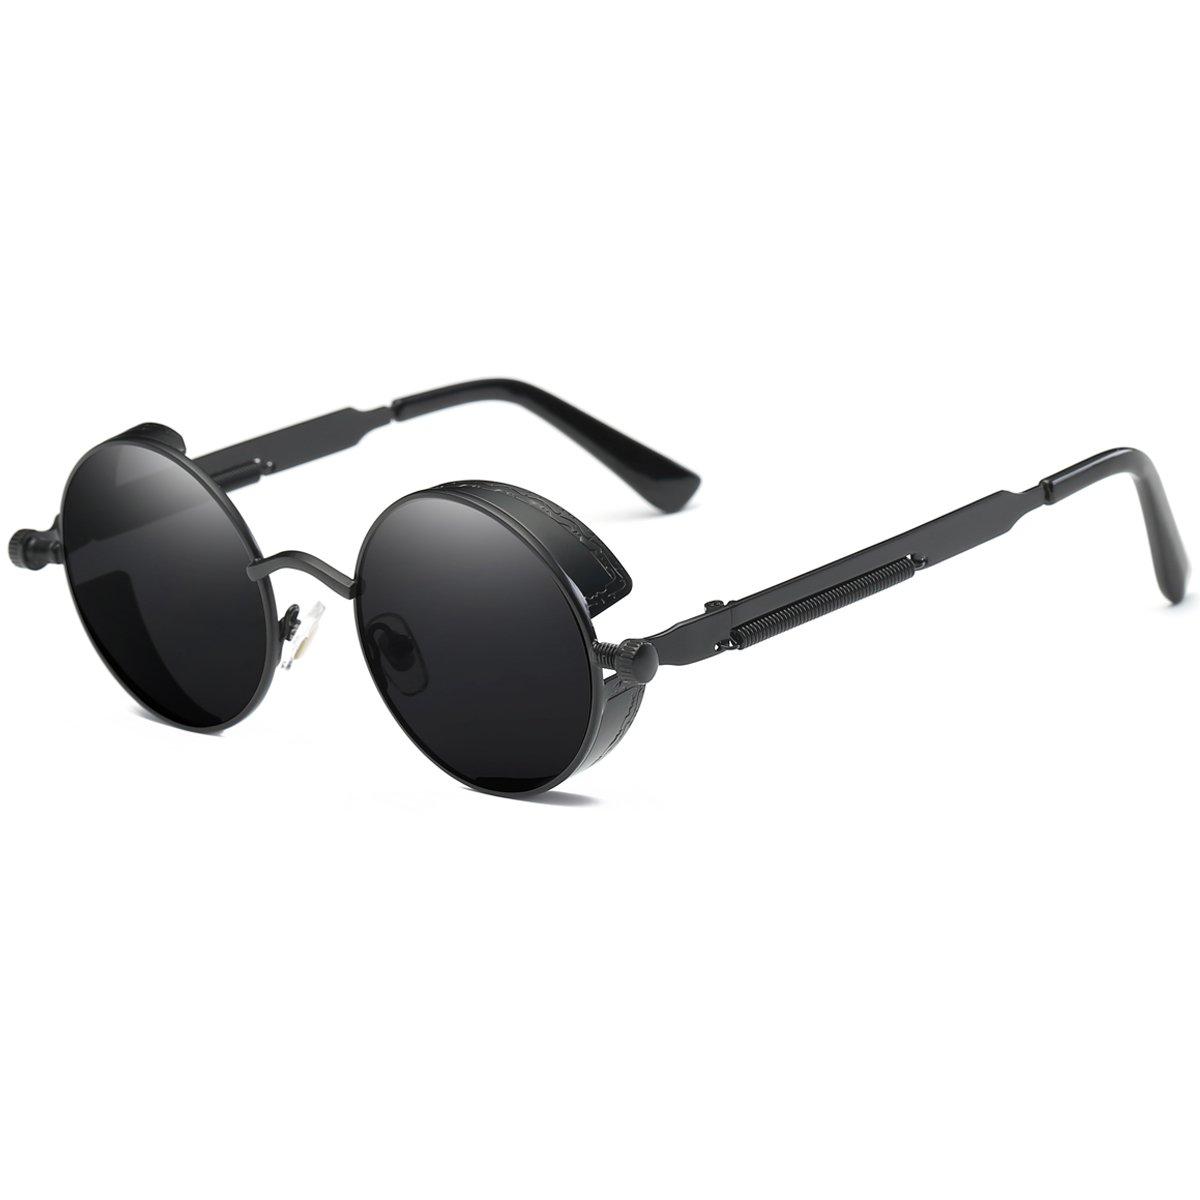 Dollger Gothic Steampunk Black Round Glasses Metal Frame Sunglasses by Dollger